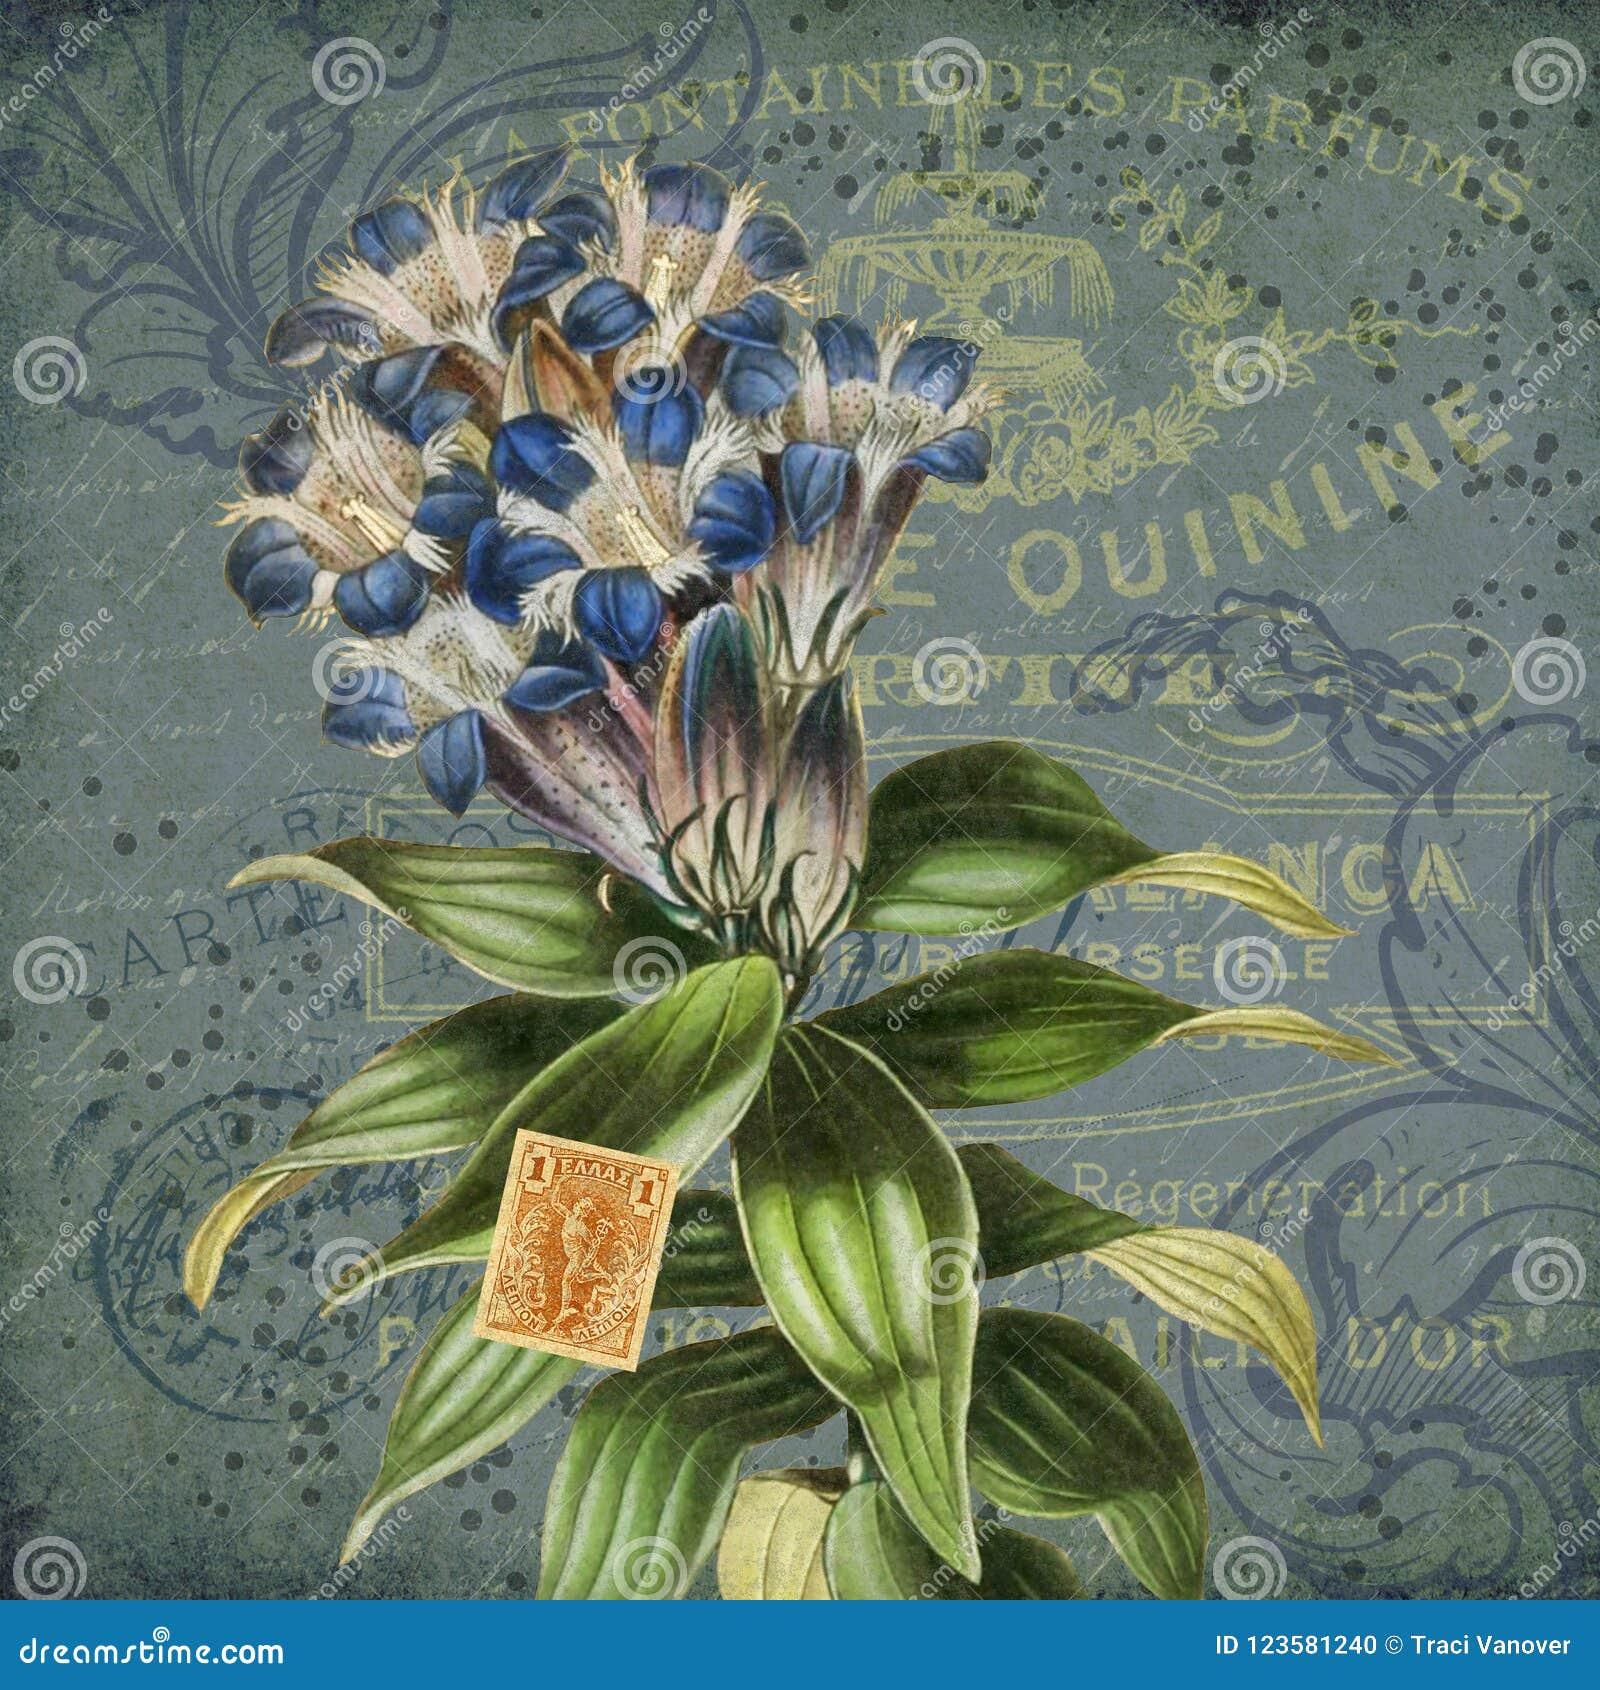 Vintage Floral Collage Illustration - Antique Style Collage